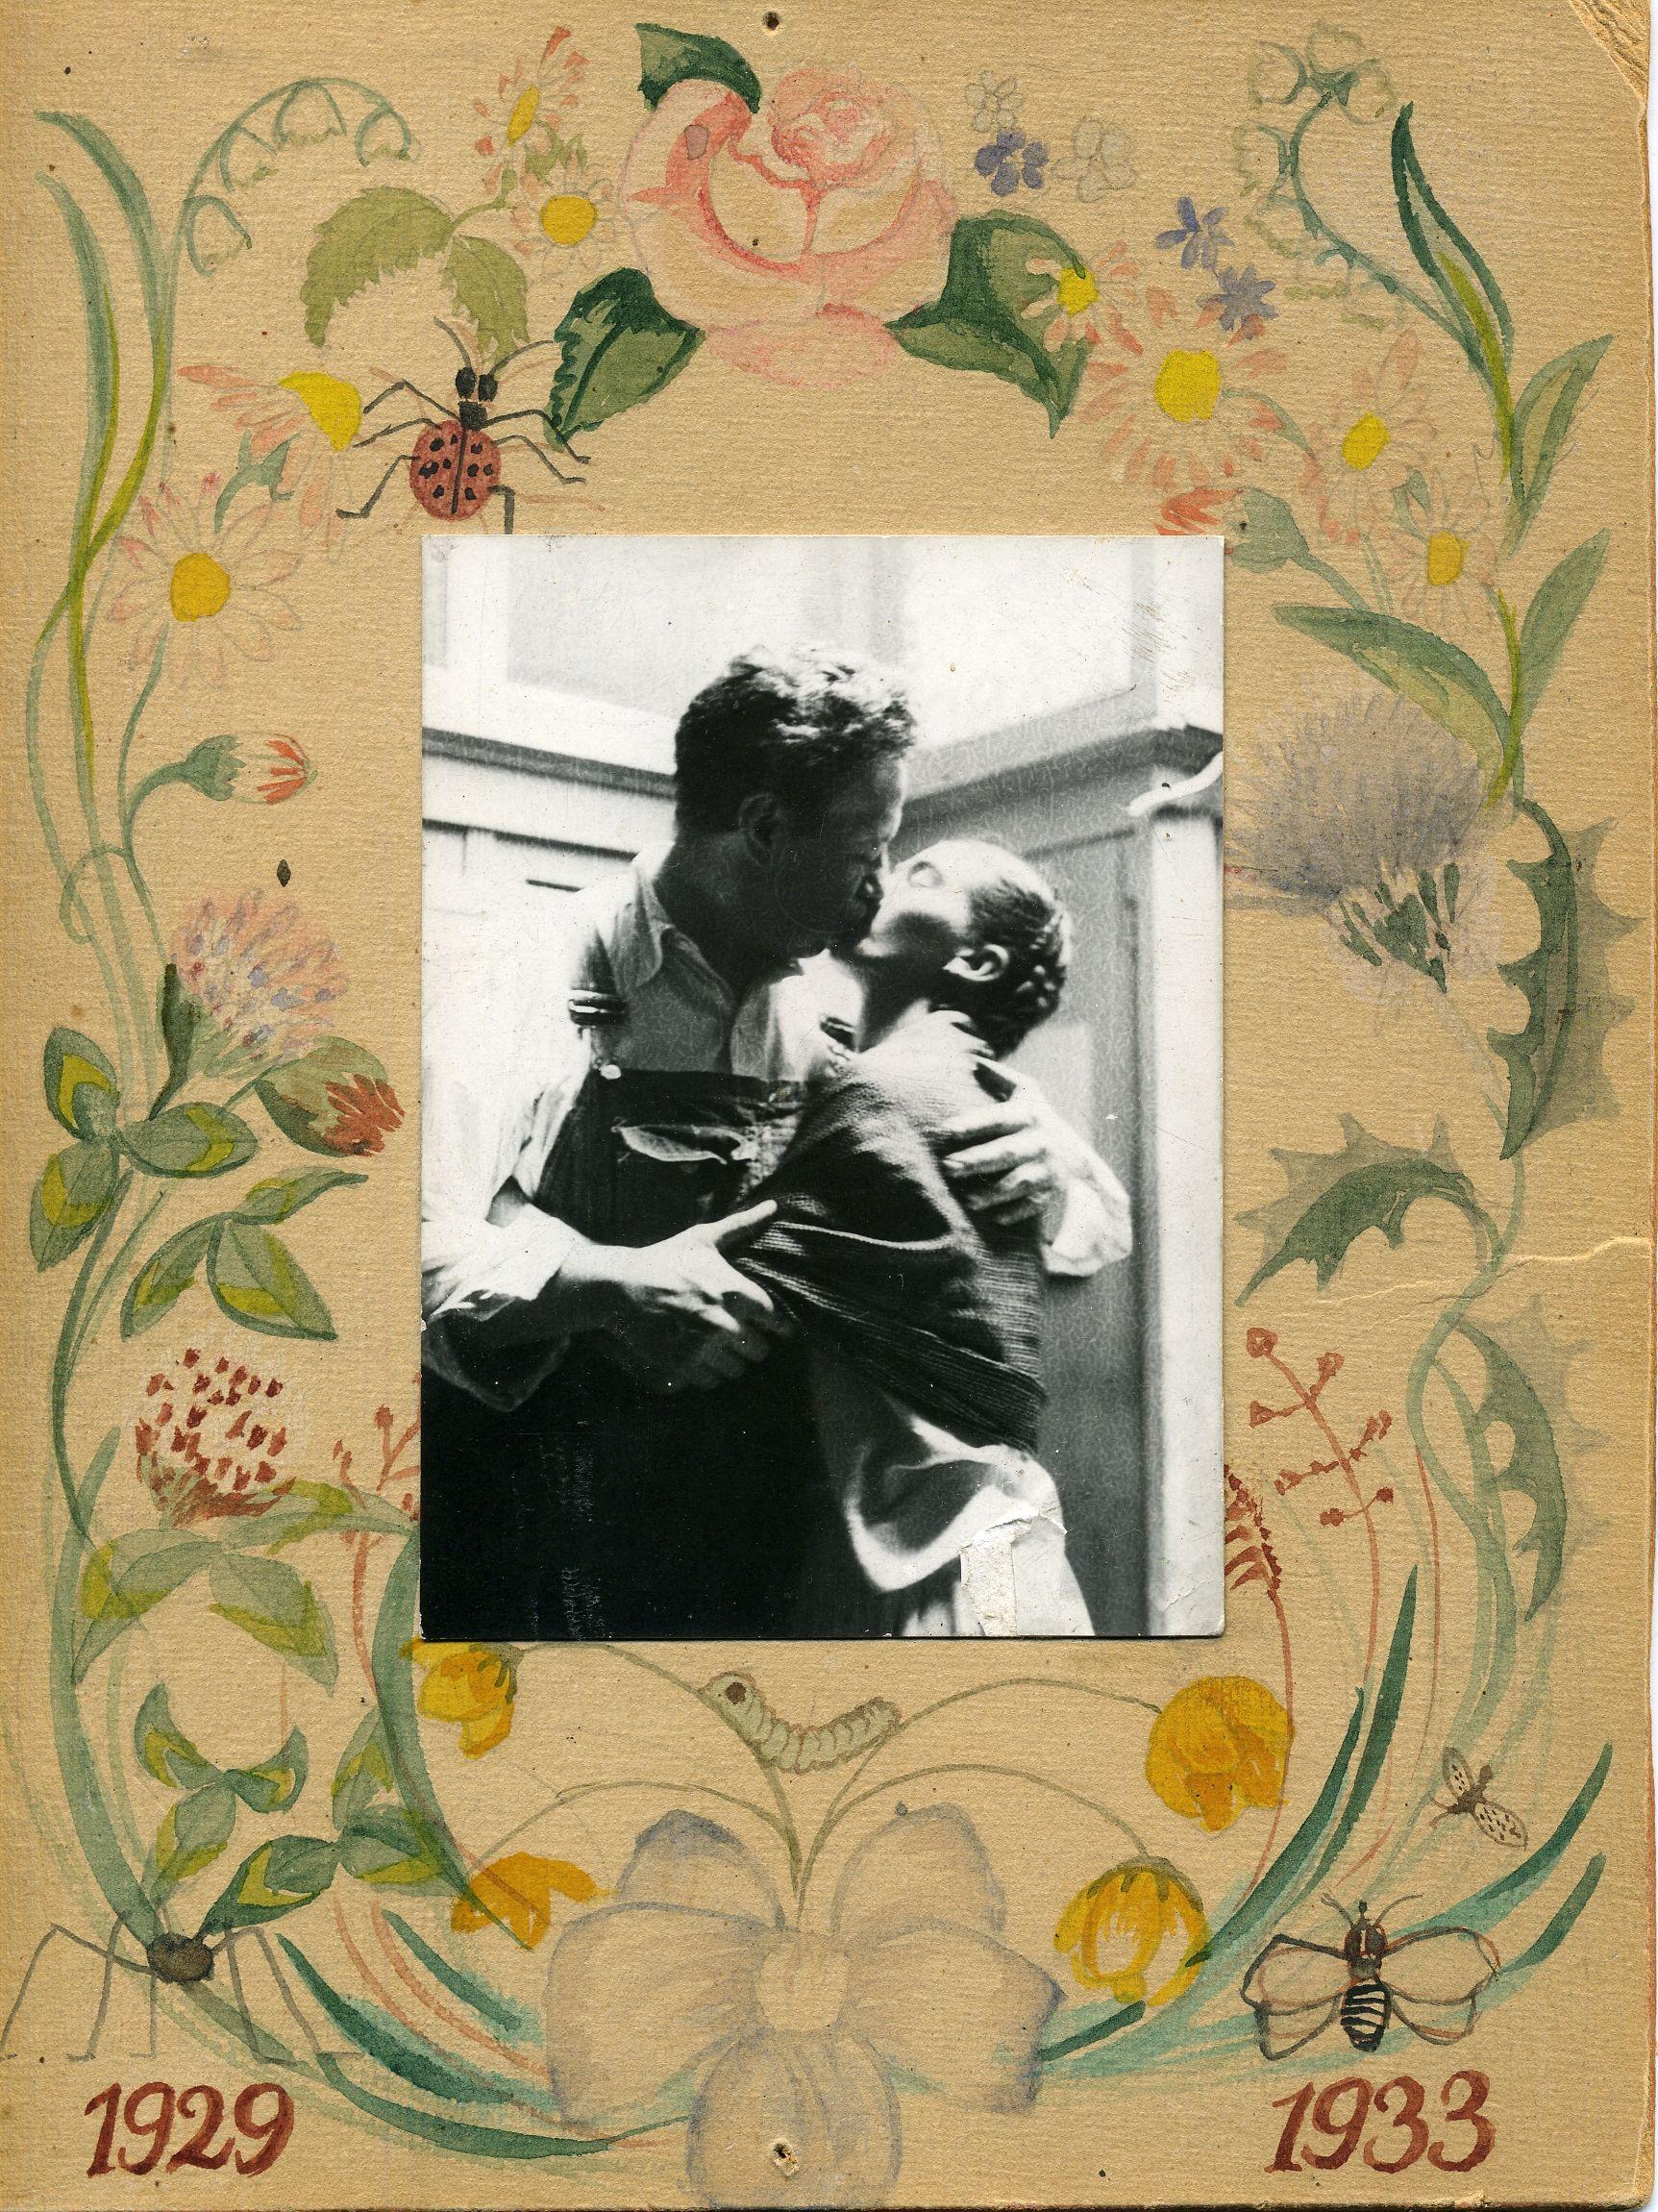 Pin Van Tere Arce Op Cartas De Amor Entre Frida Kahlo Y Diego Rivera Artiesten Kunstenaar Foto S